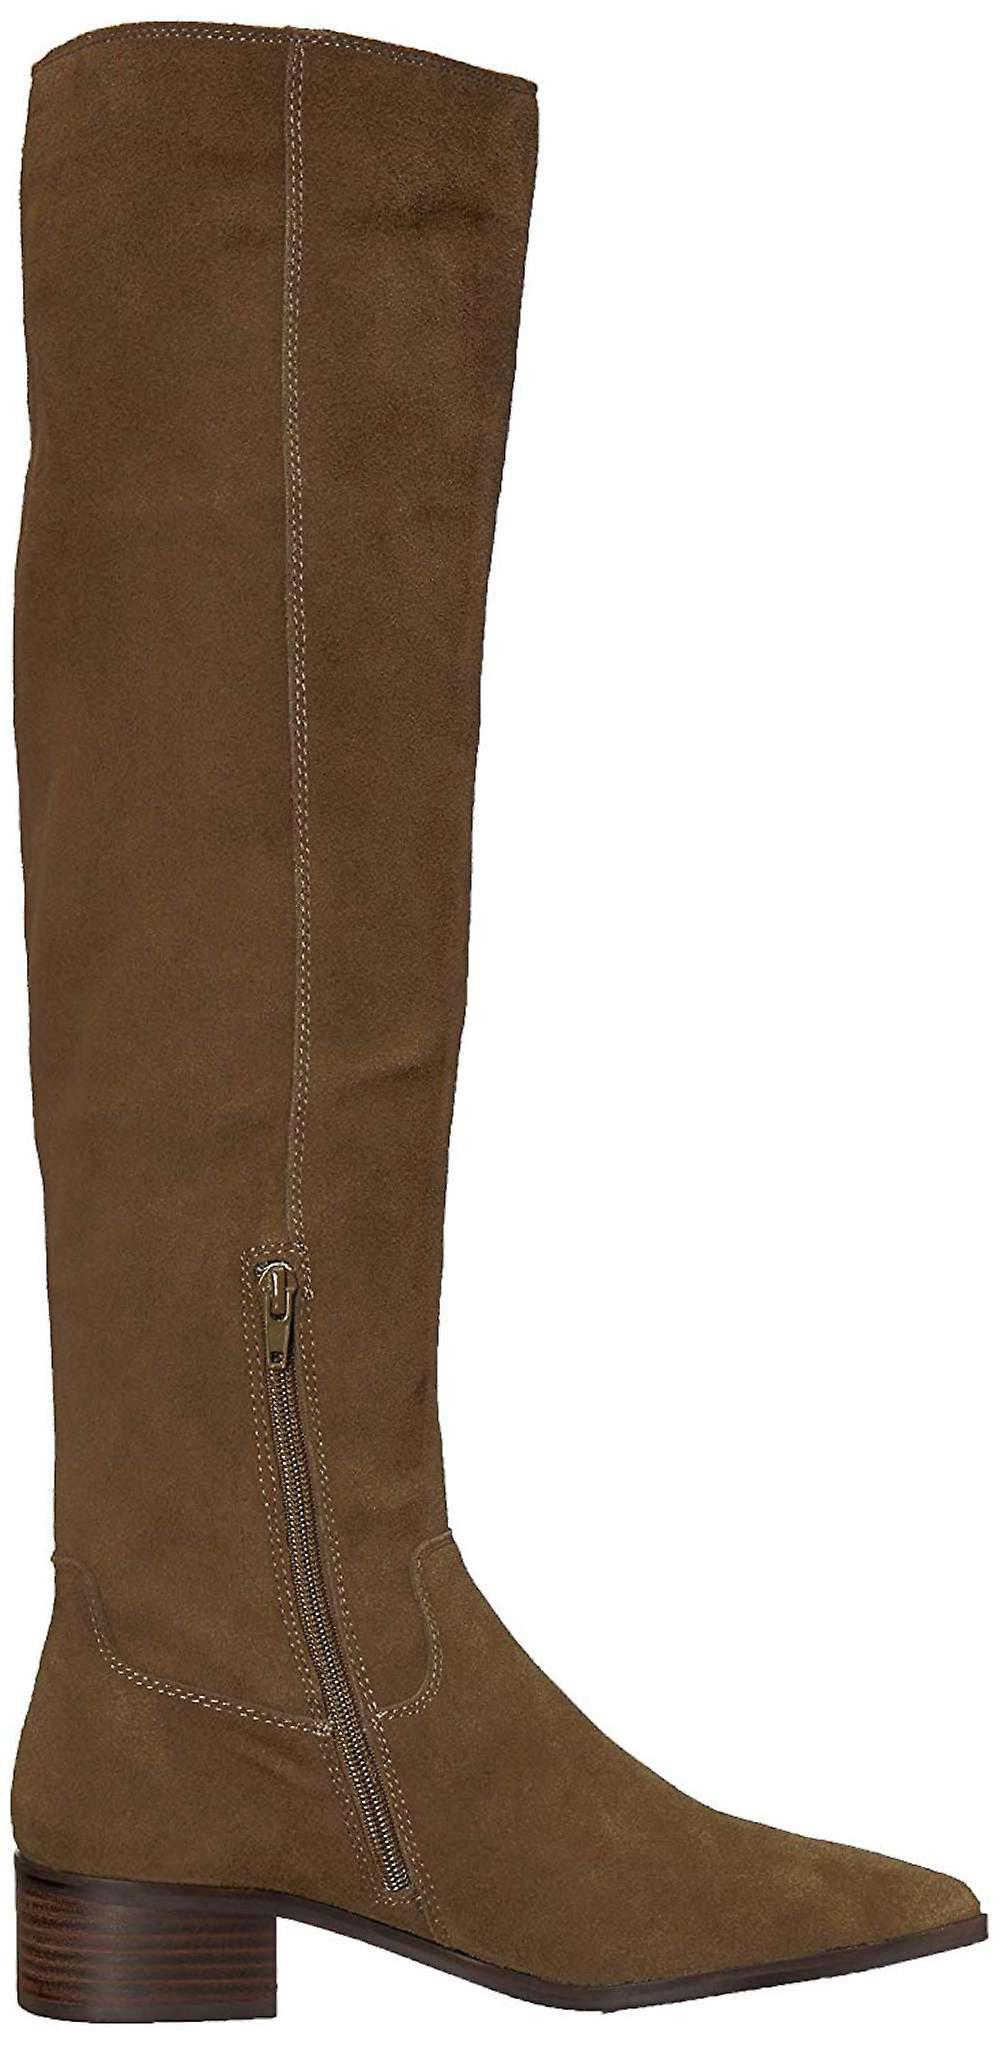 Lucky Brand Womens Kitrie Fabric Wskazał Toe Knee High Fashion Boots tZ2sW